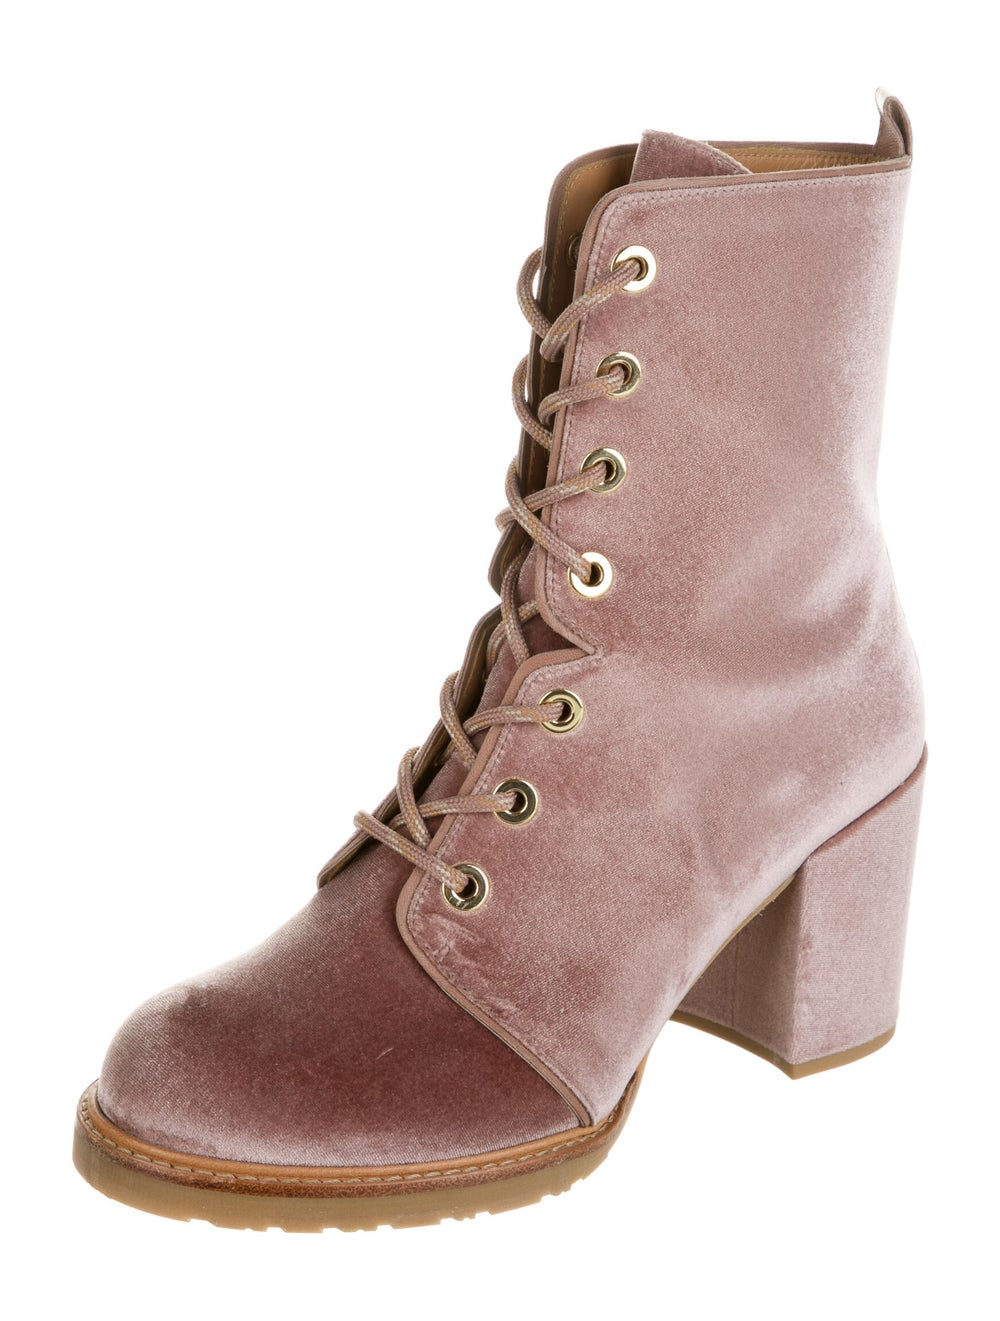 Stuart Weitzman Lace-Up Boots Pink - image 2